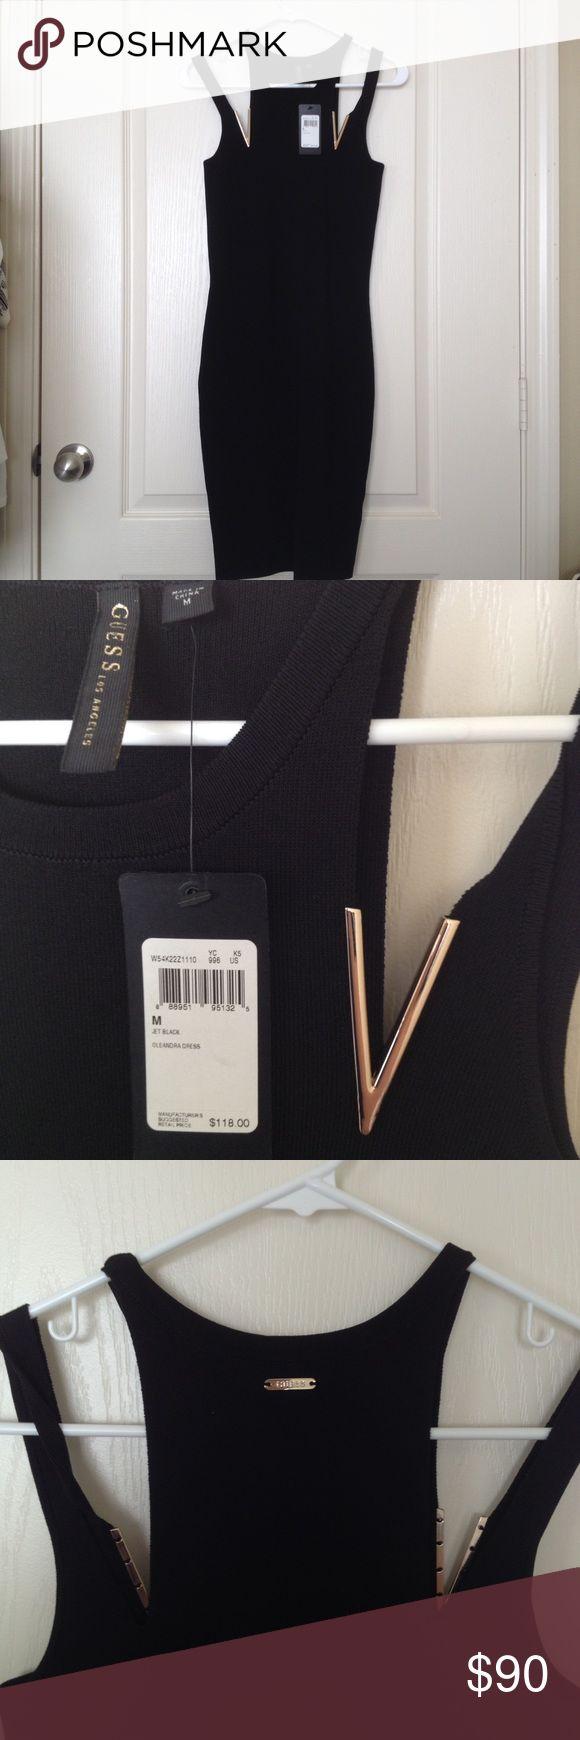 NWT Guess dress size m black NWT Guess dress size m black new with tags Guess Dresses